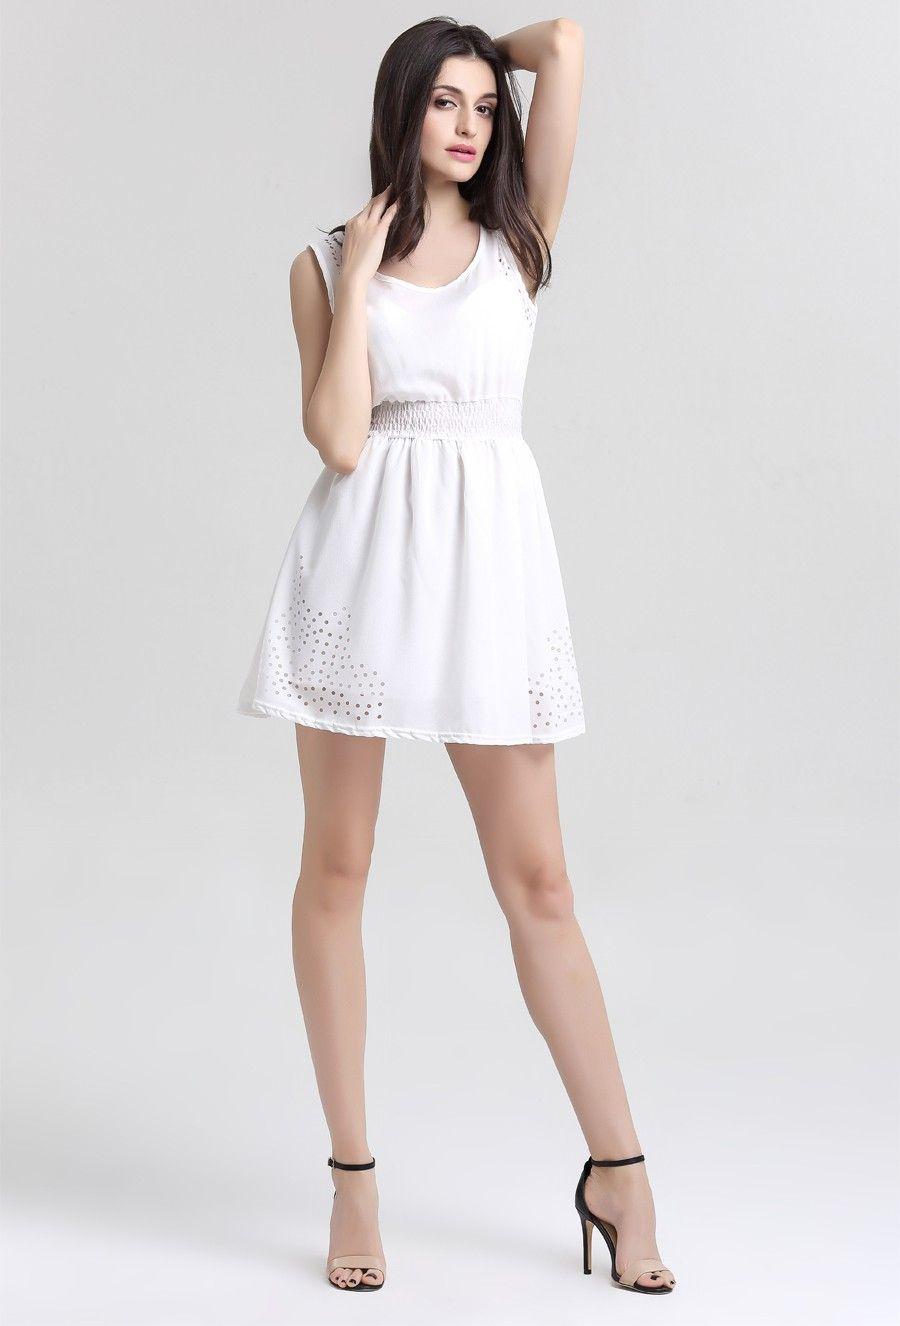 Sleeveless hollow white chiffon dress first date dress pinterest